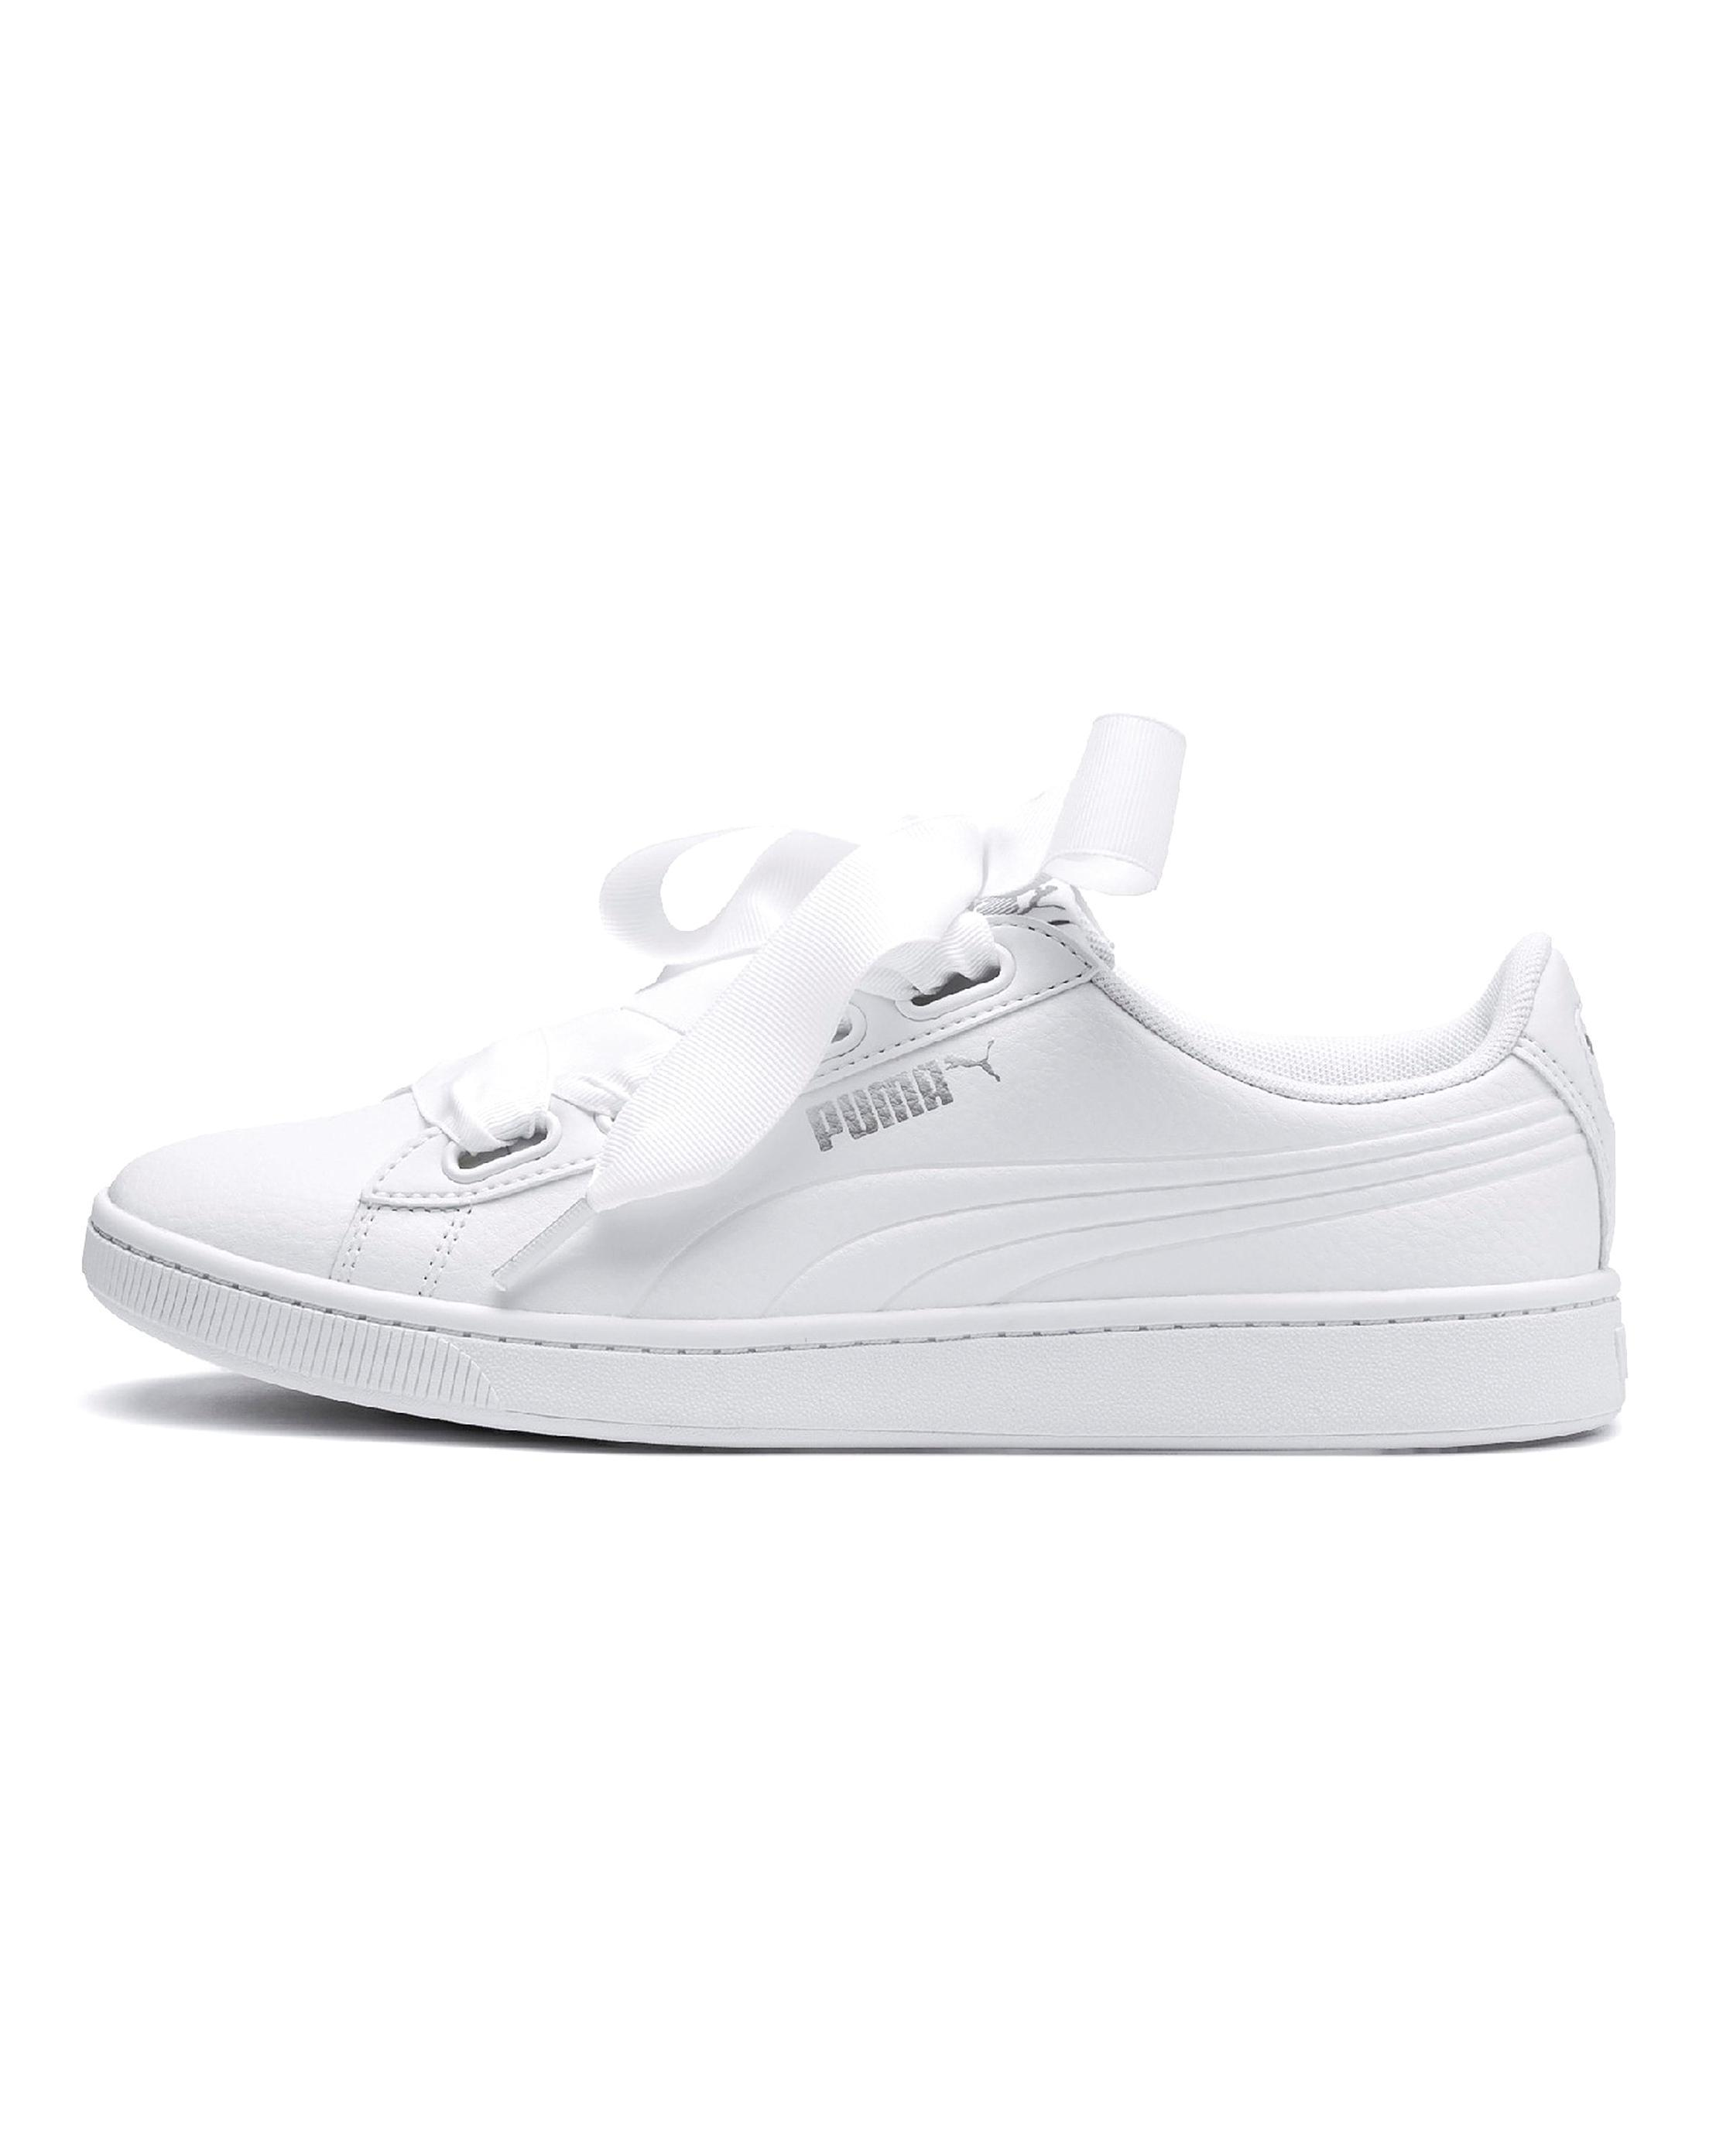 Lyst - Simply Be Puma Vikky V2 Ribbon Sneakers in White bada4a3e5